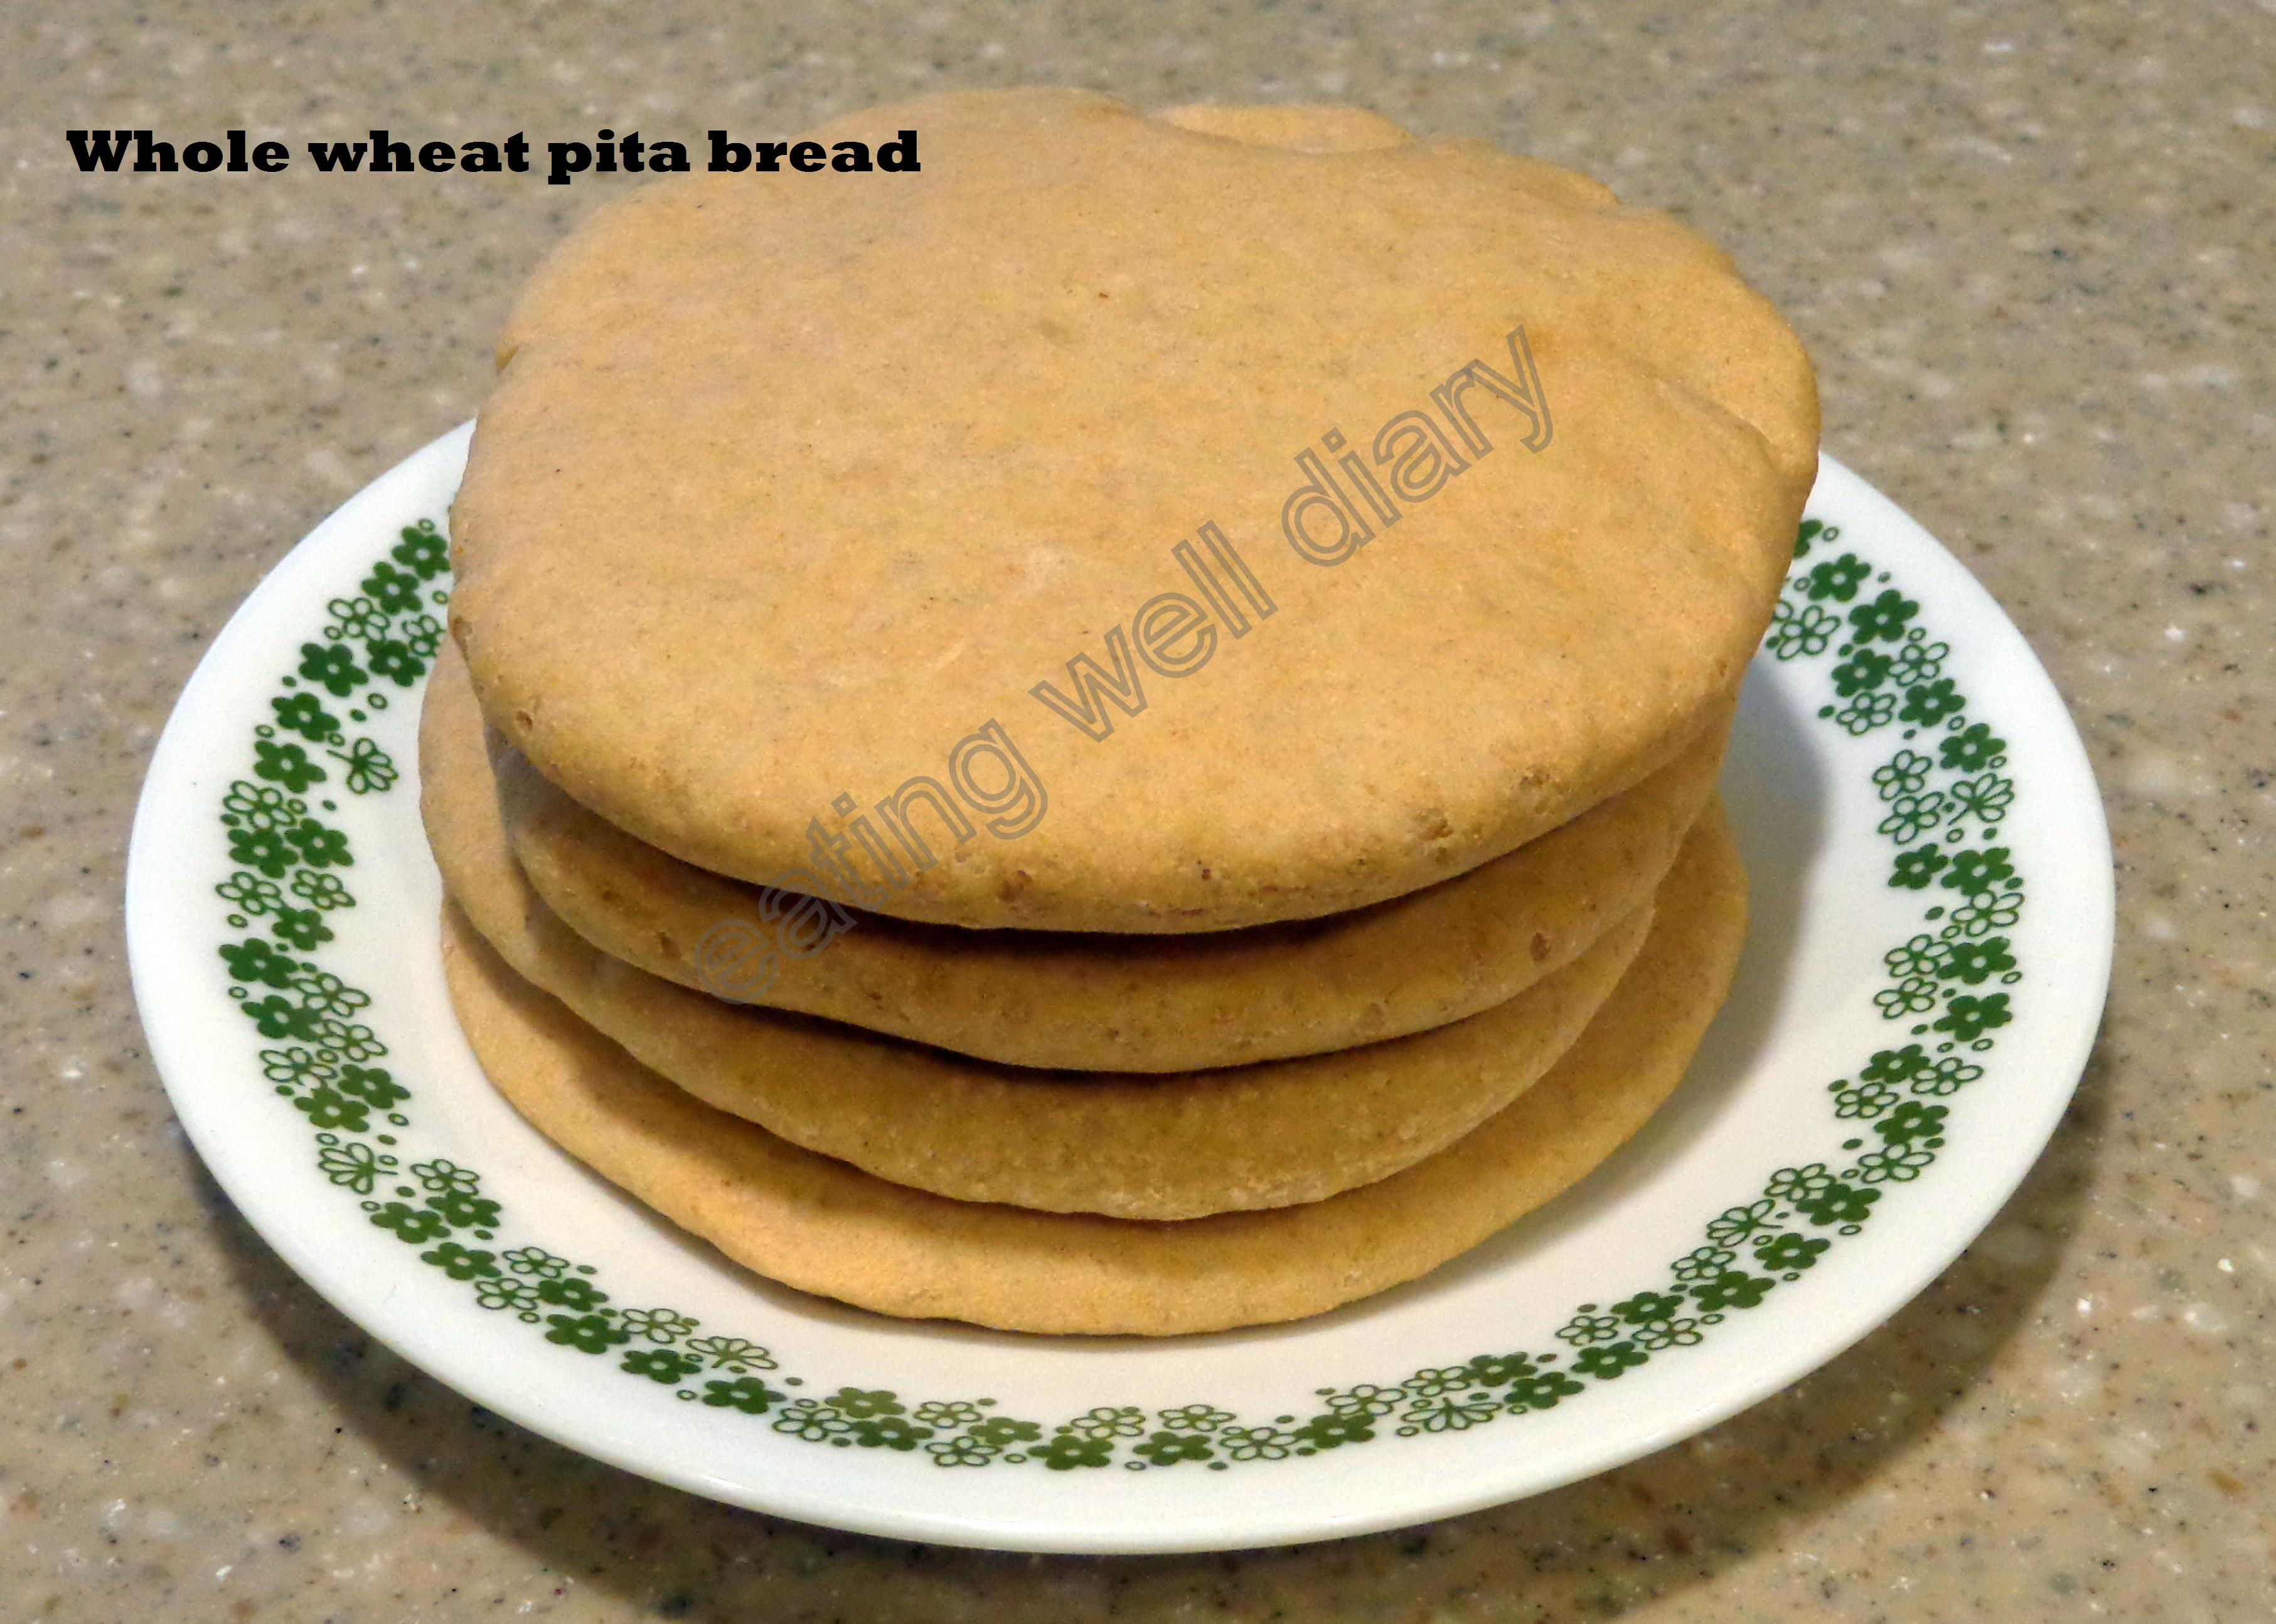 Whole Wheat Pita Bread Healthy  whole wheat pita bread EATING WELL DIARY